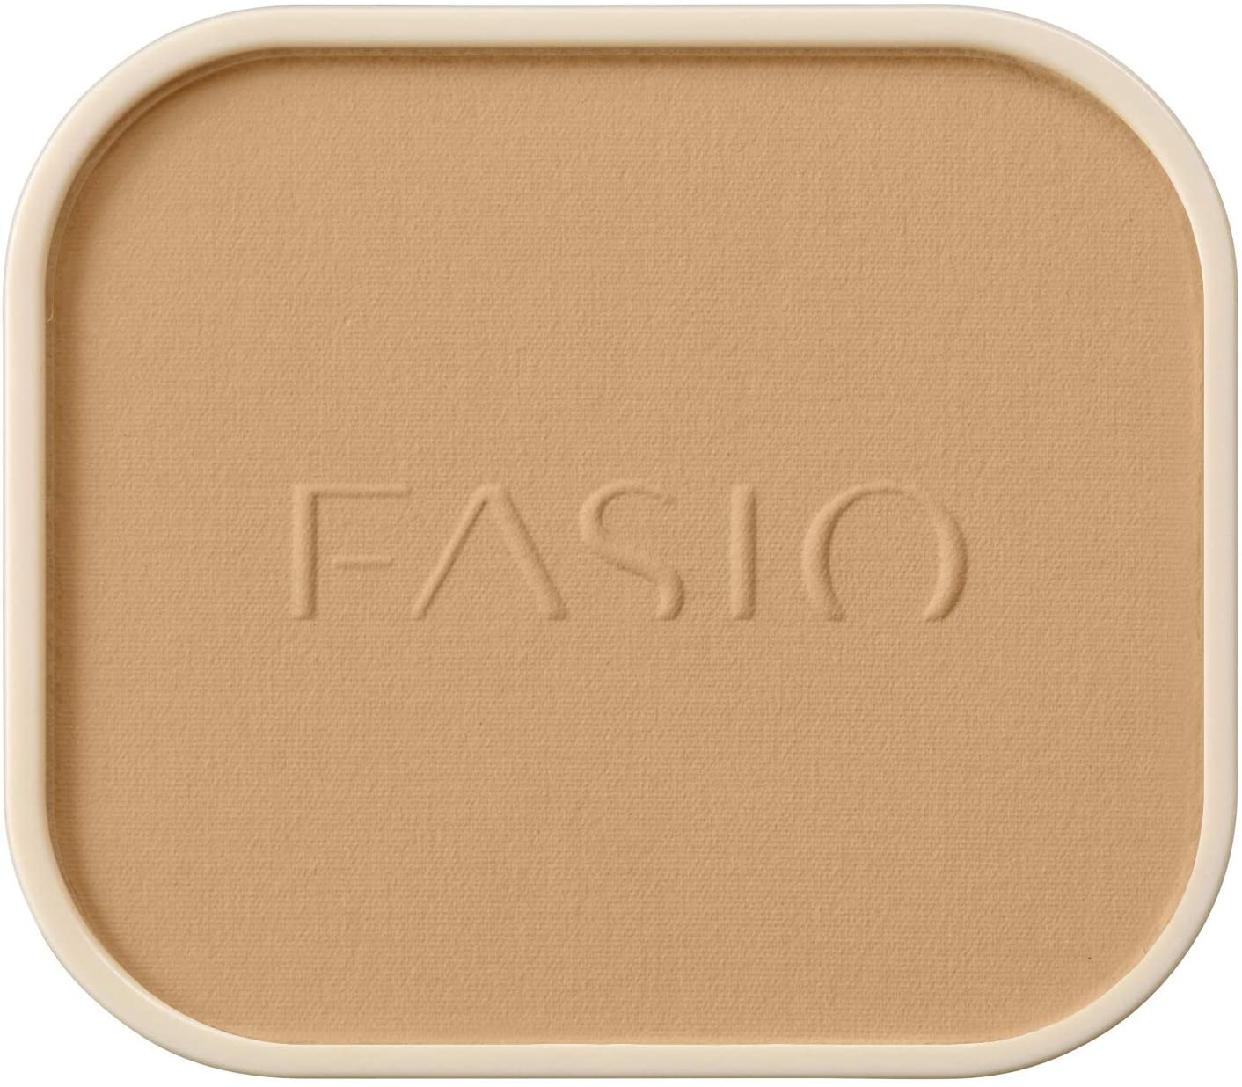 FASIO(ファシオ) ラスティング ファンデーションWP